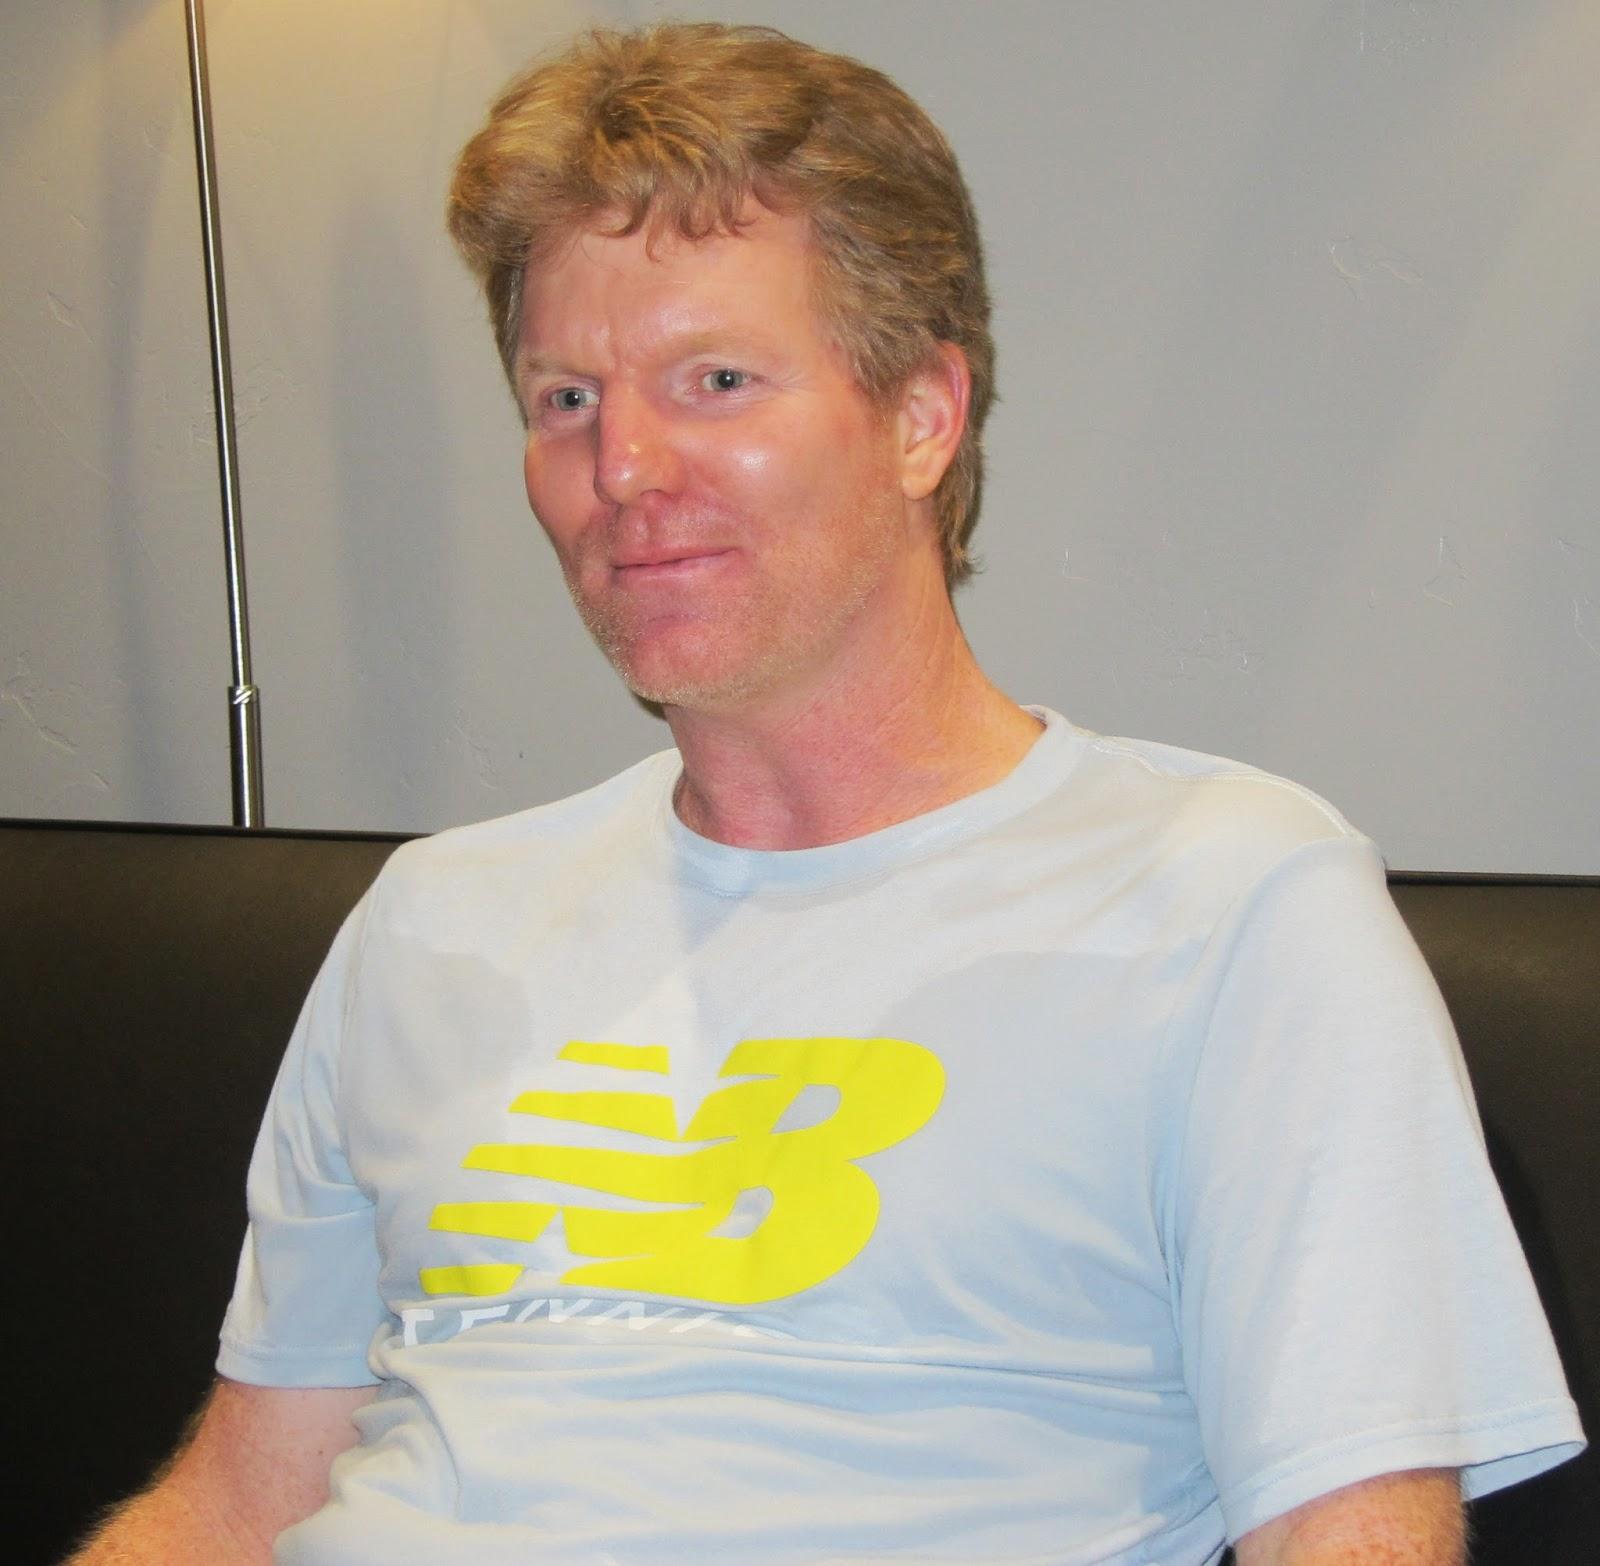 "NorCal Tennis Czar Jim Courier Q&A ""30 minutes of terror"""